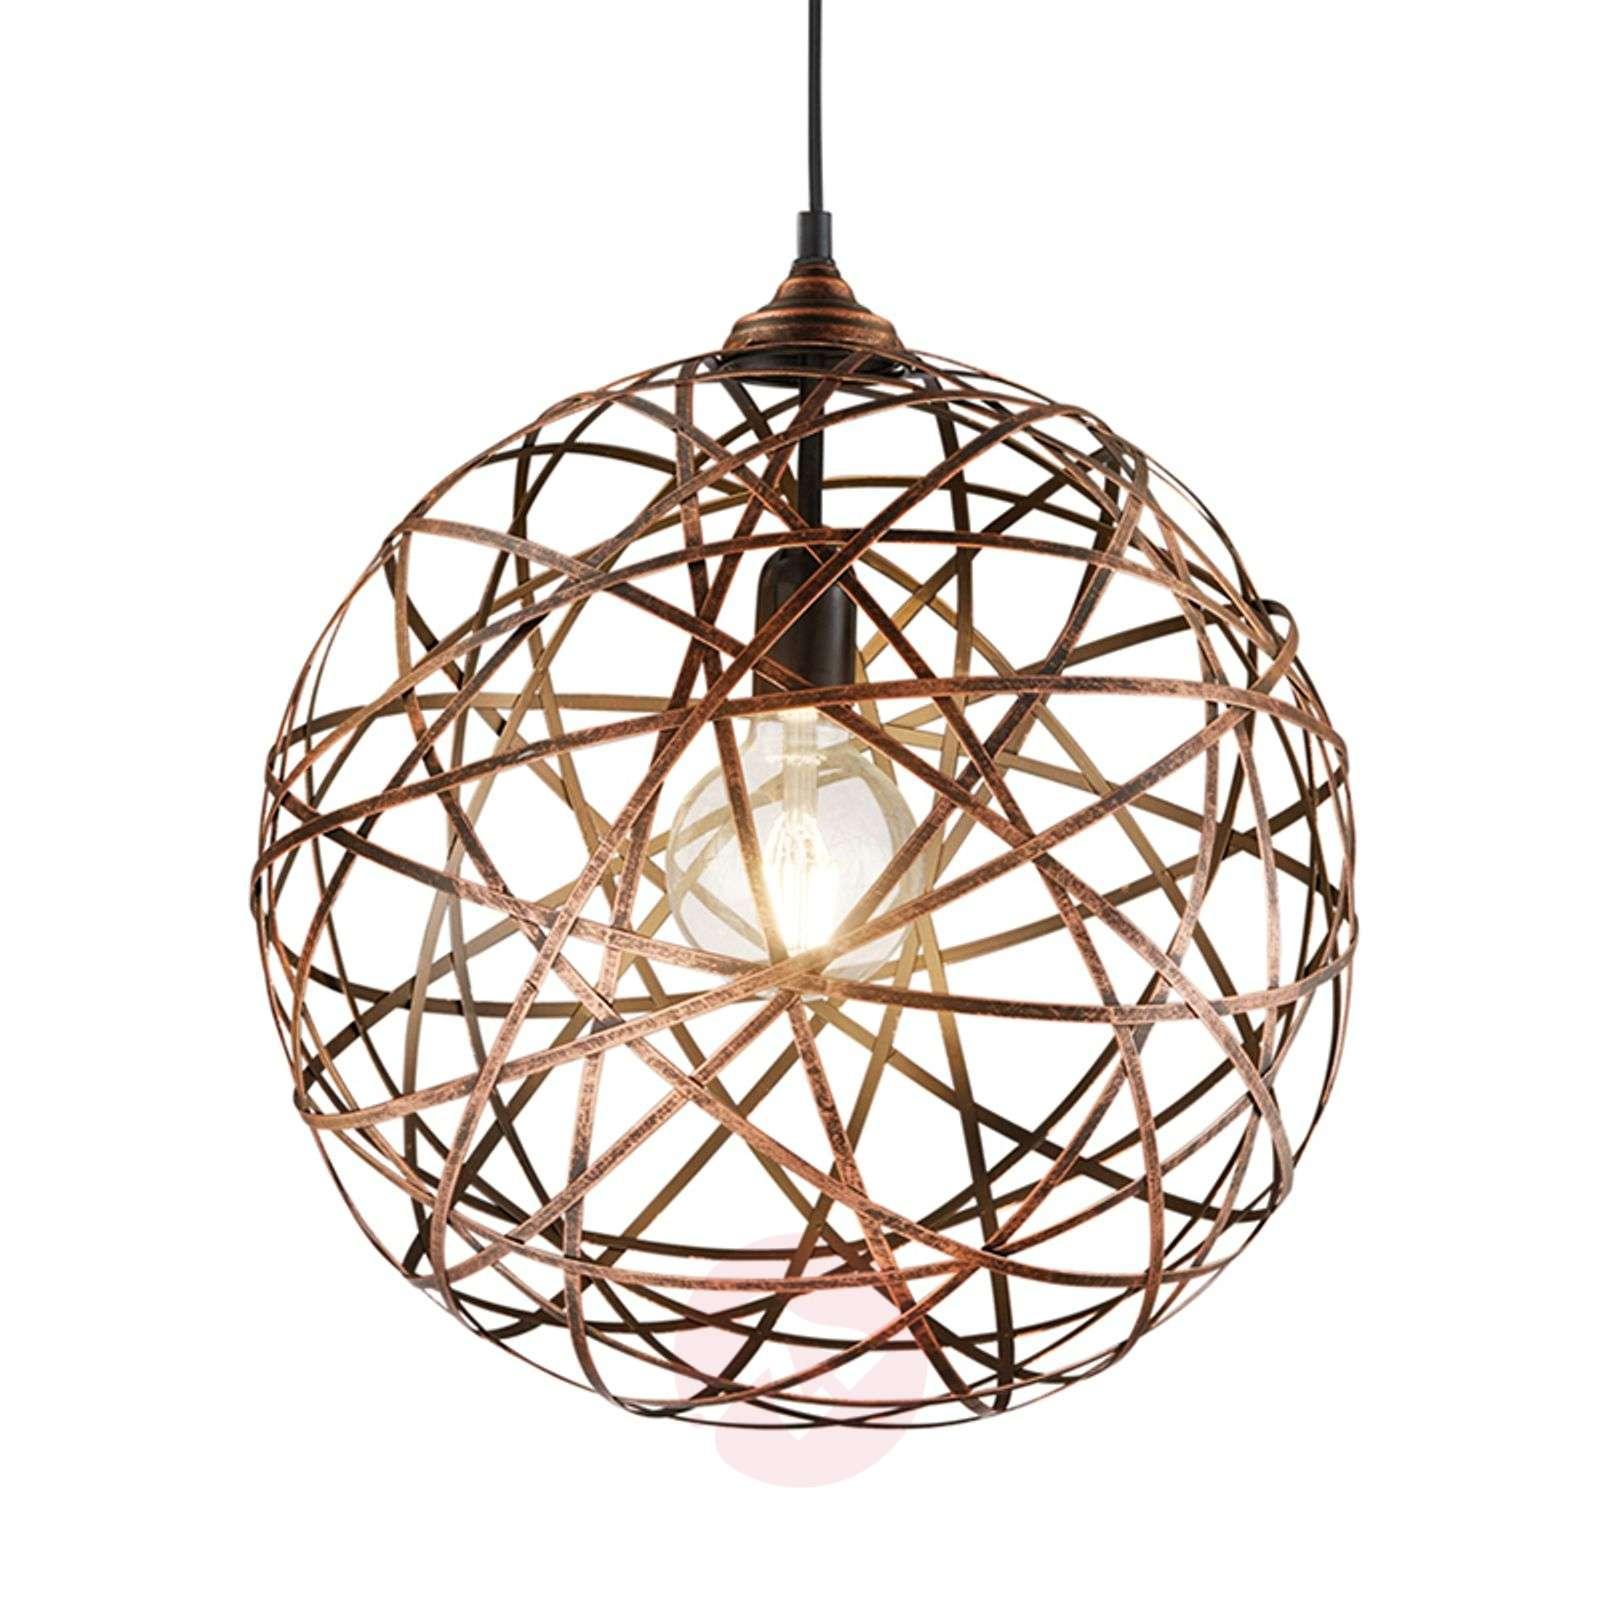 Antique copper hanging light Jacob-9005299-01